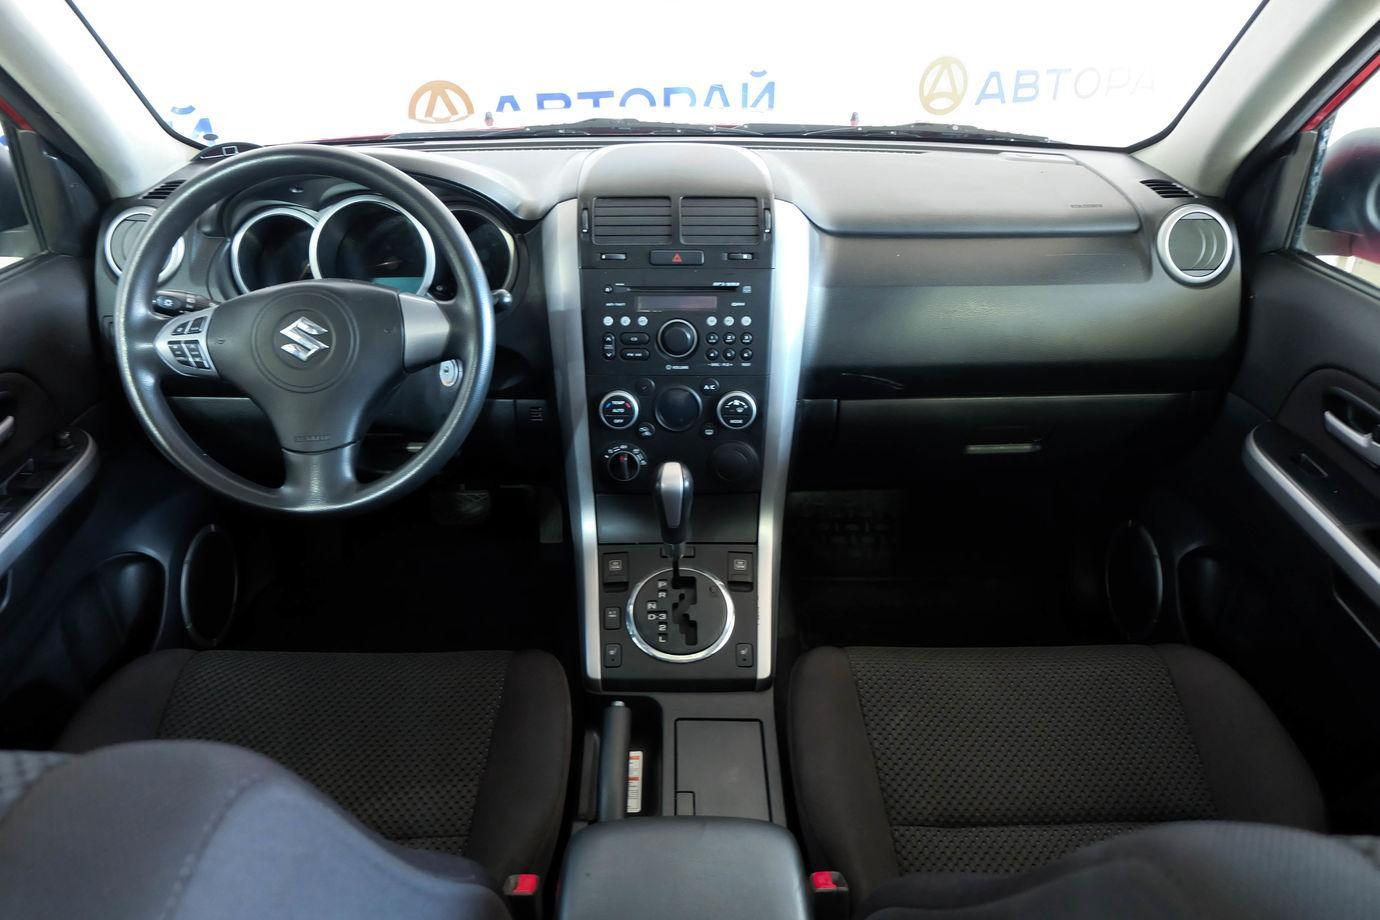 Suzuki Grand Vitara, III Рестайлинг 2011г.